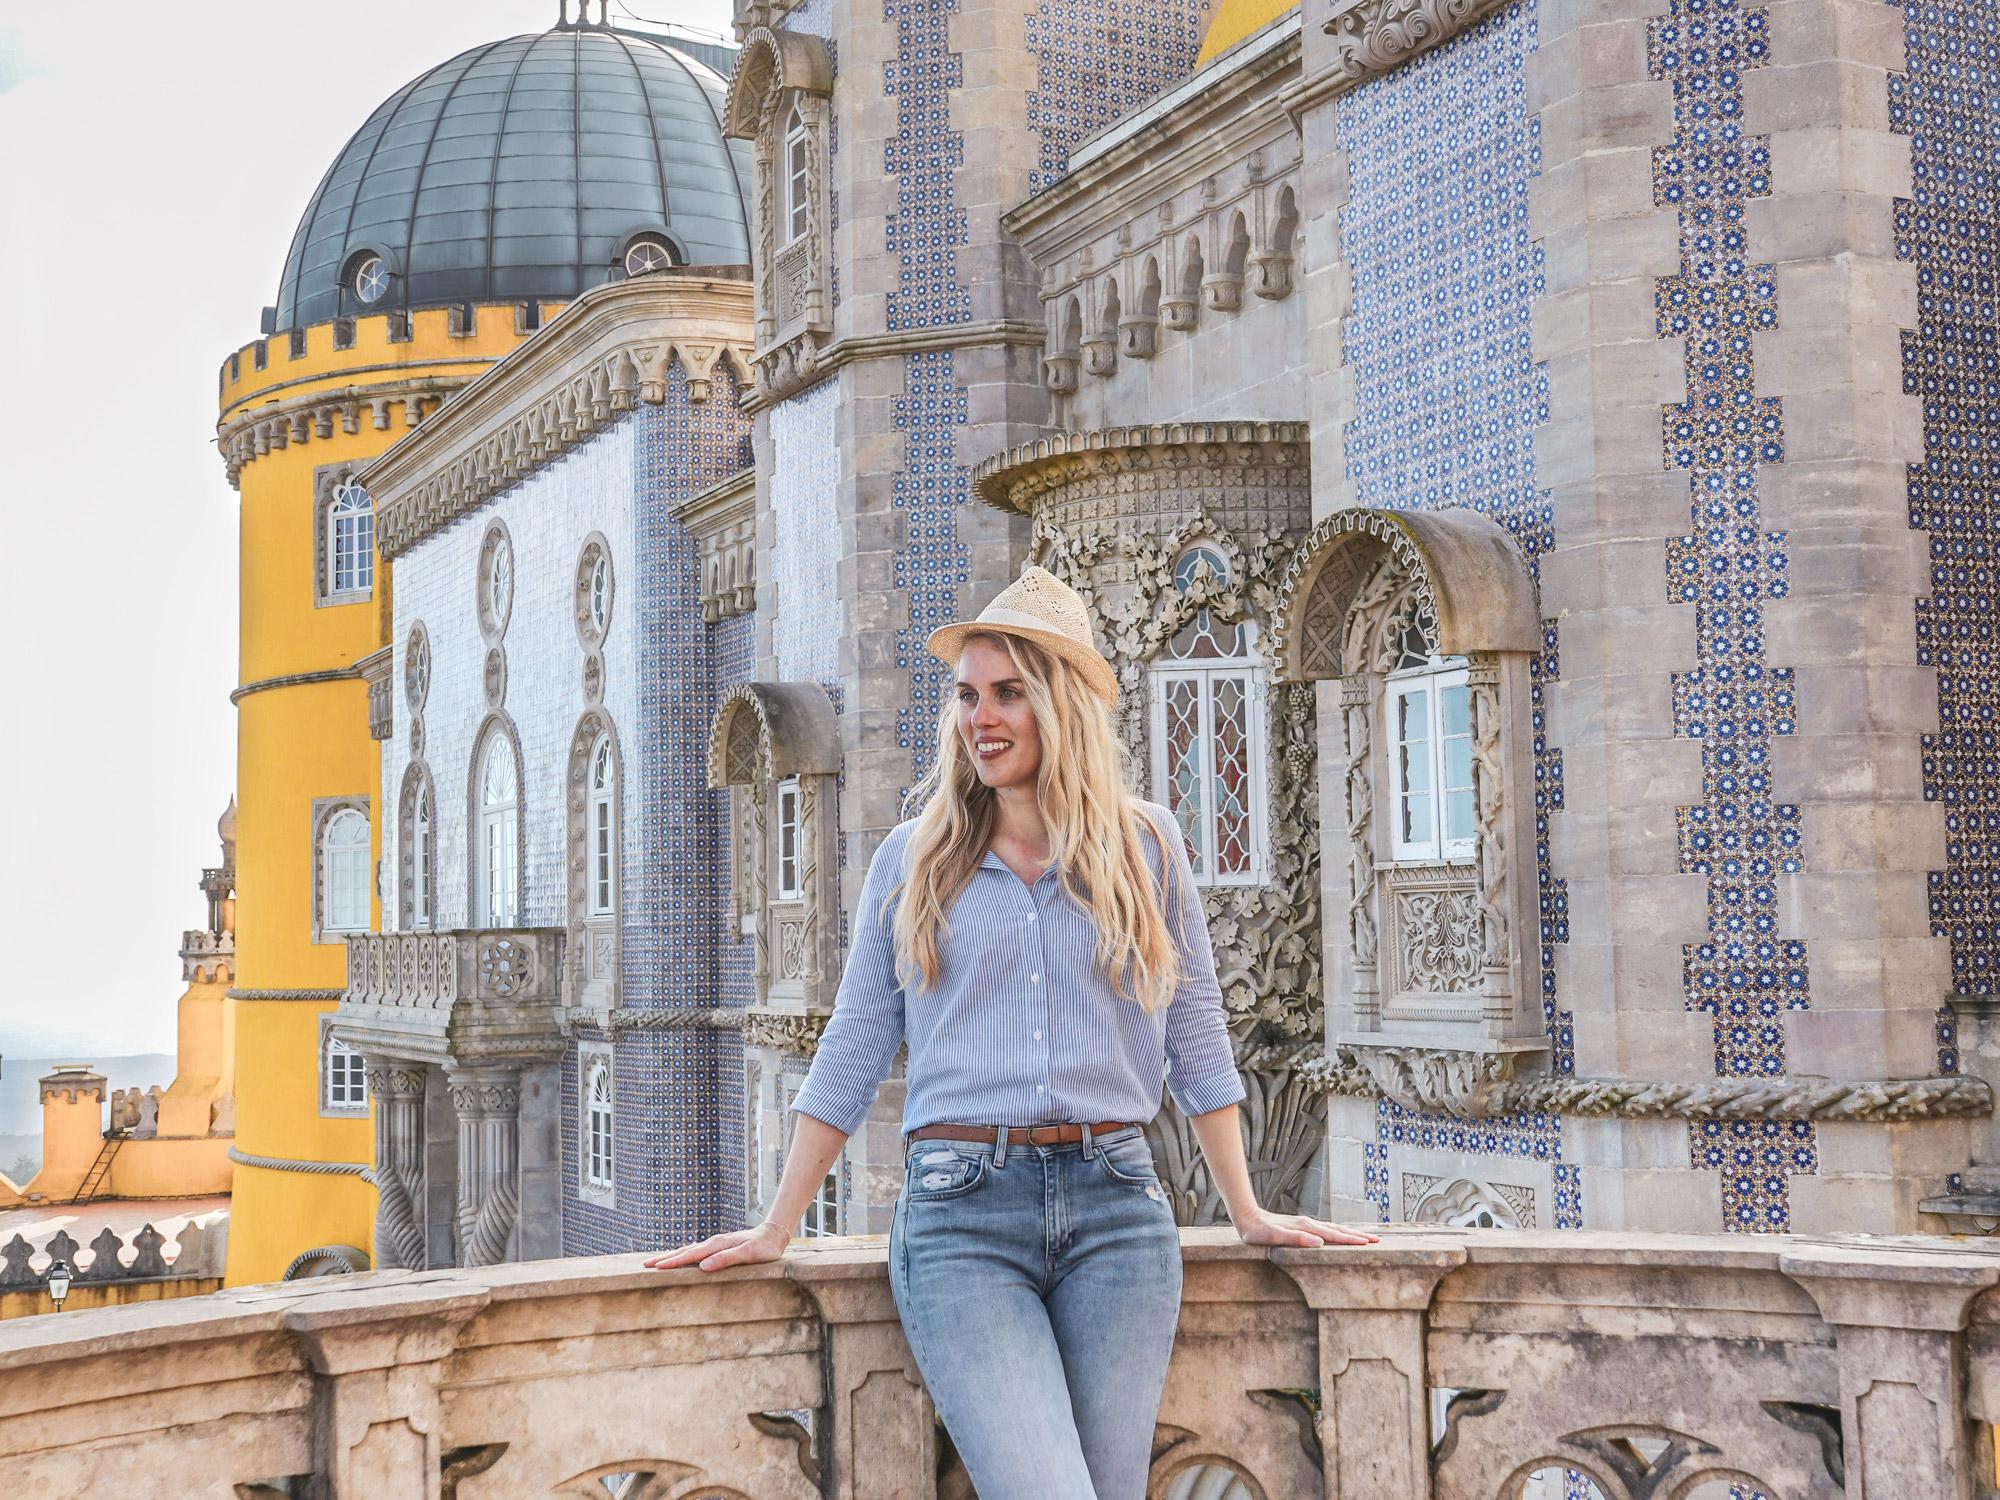 Brenda - Pena Palace Sintra, Portugal